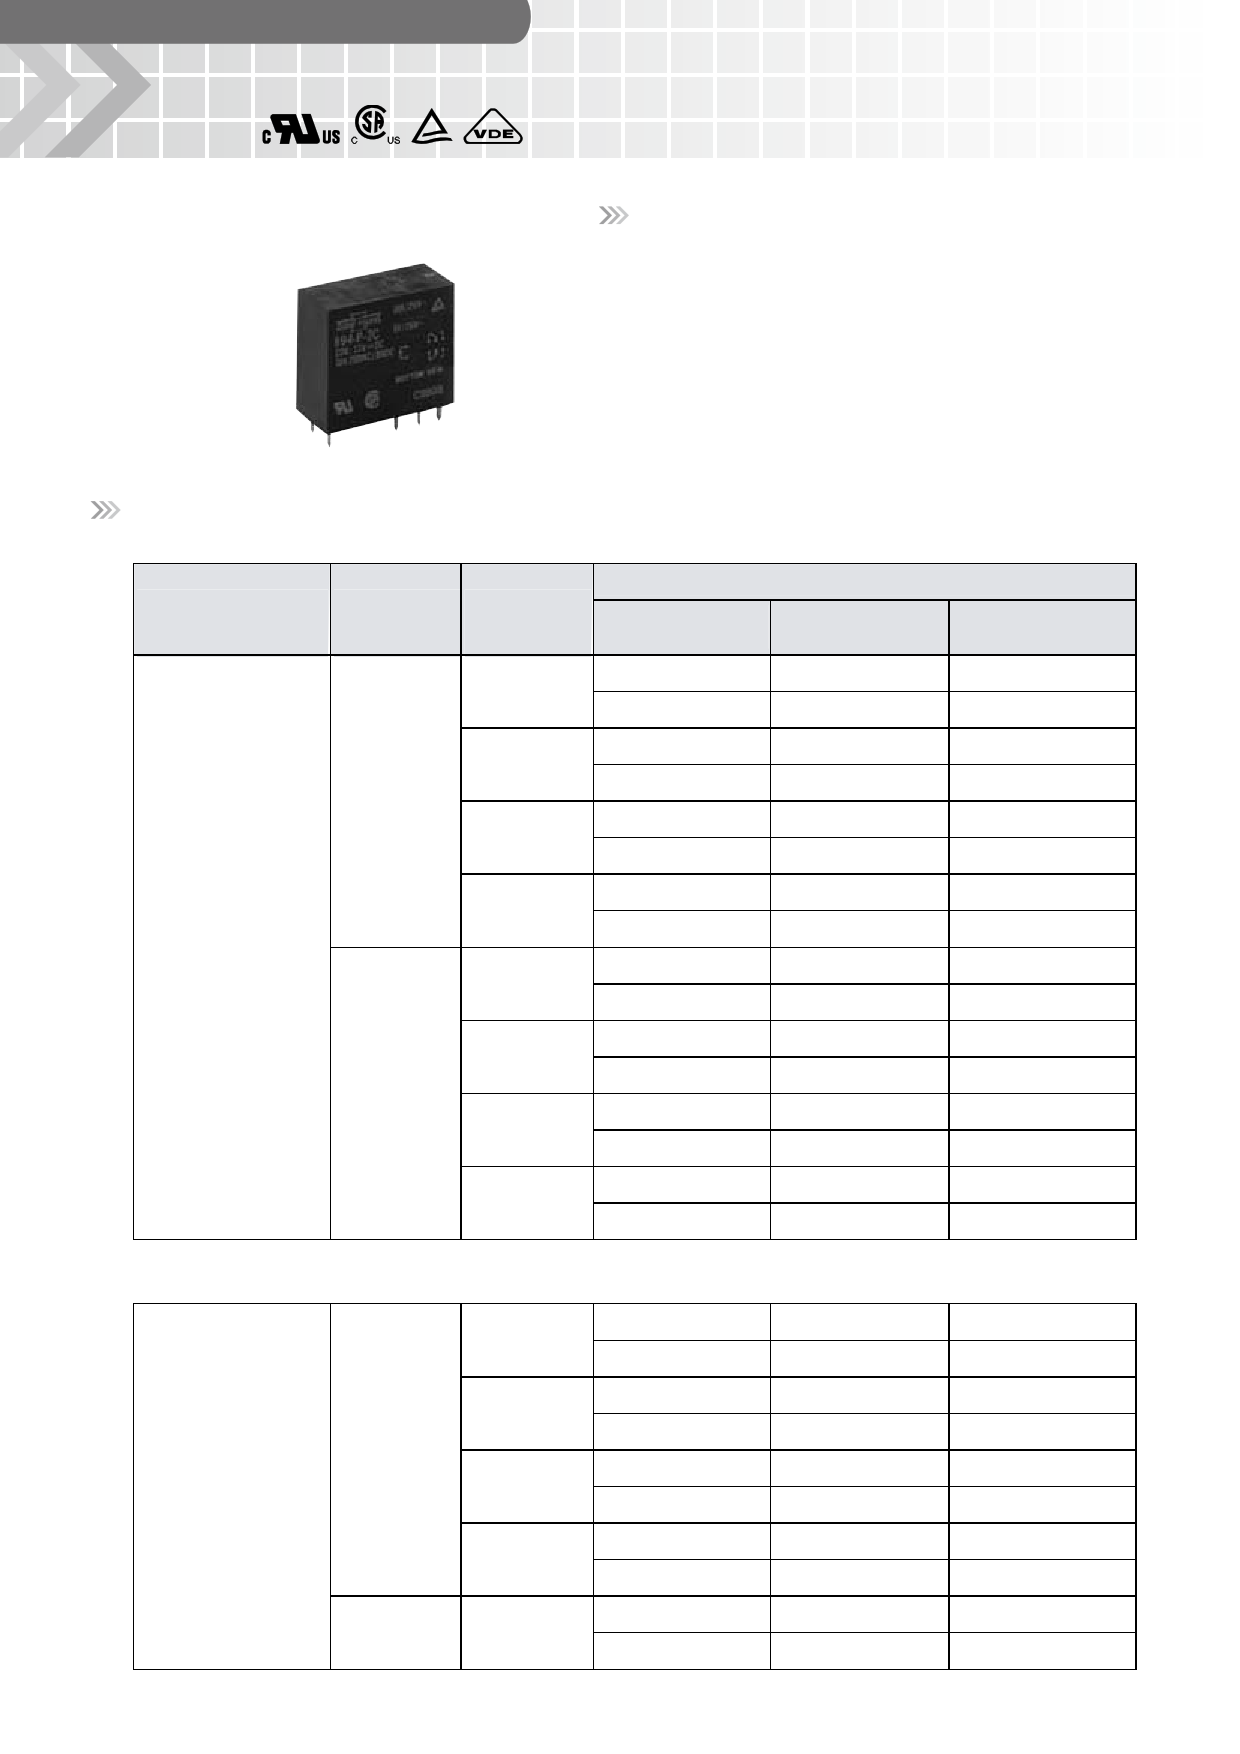 894-2ACA1-F-C Datasheet, 894-2ACA1-F-C PDF,ピン配置, 機能